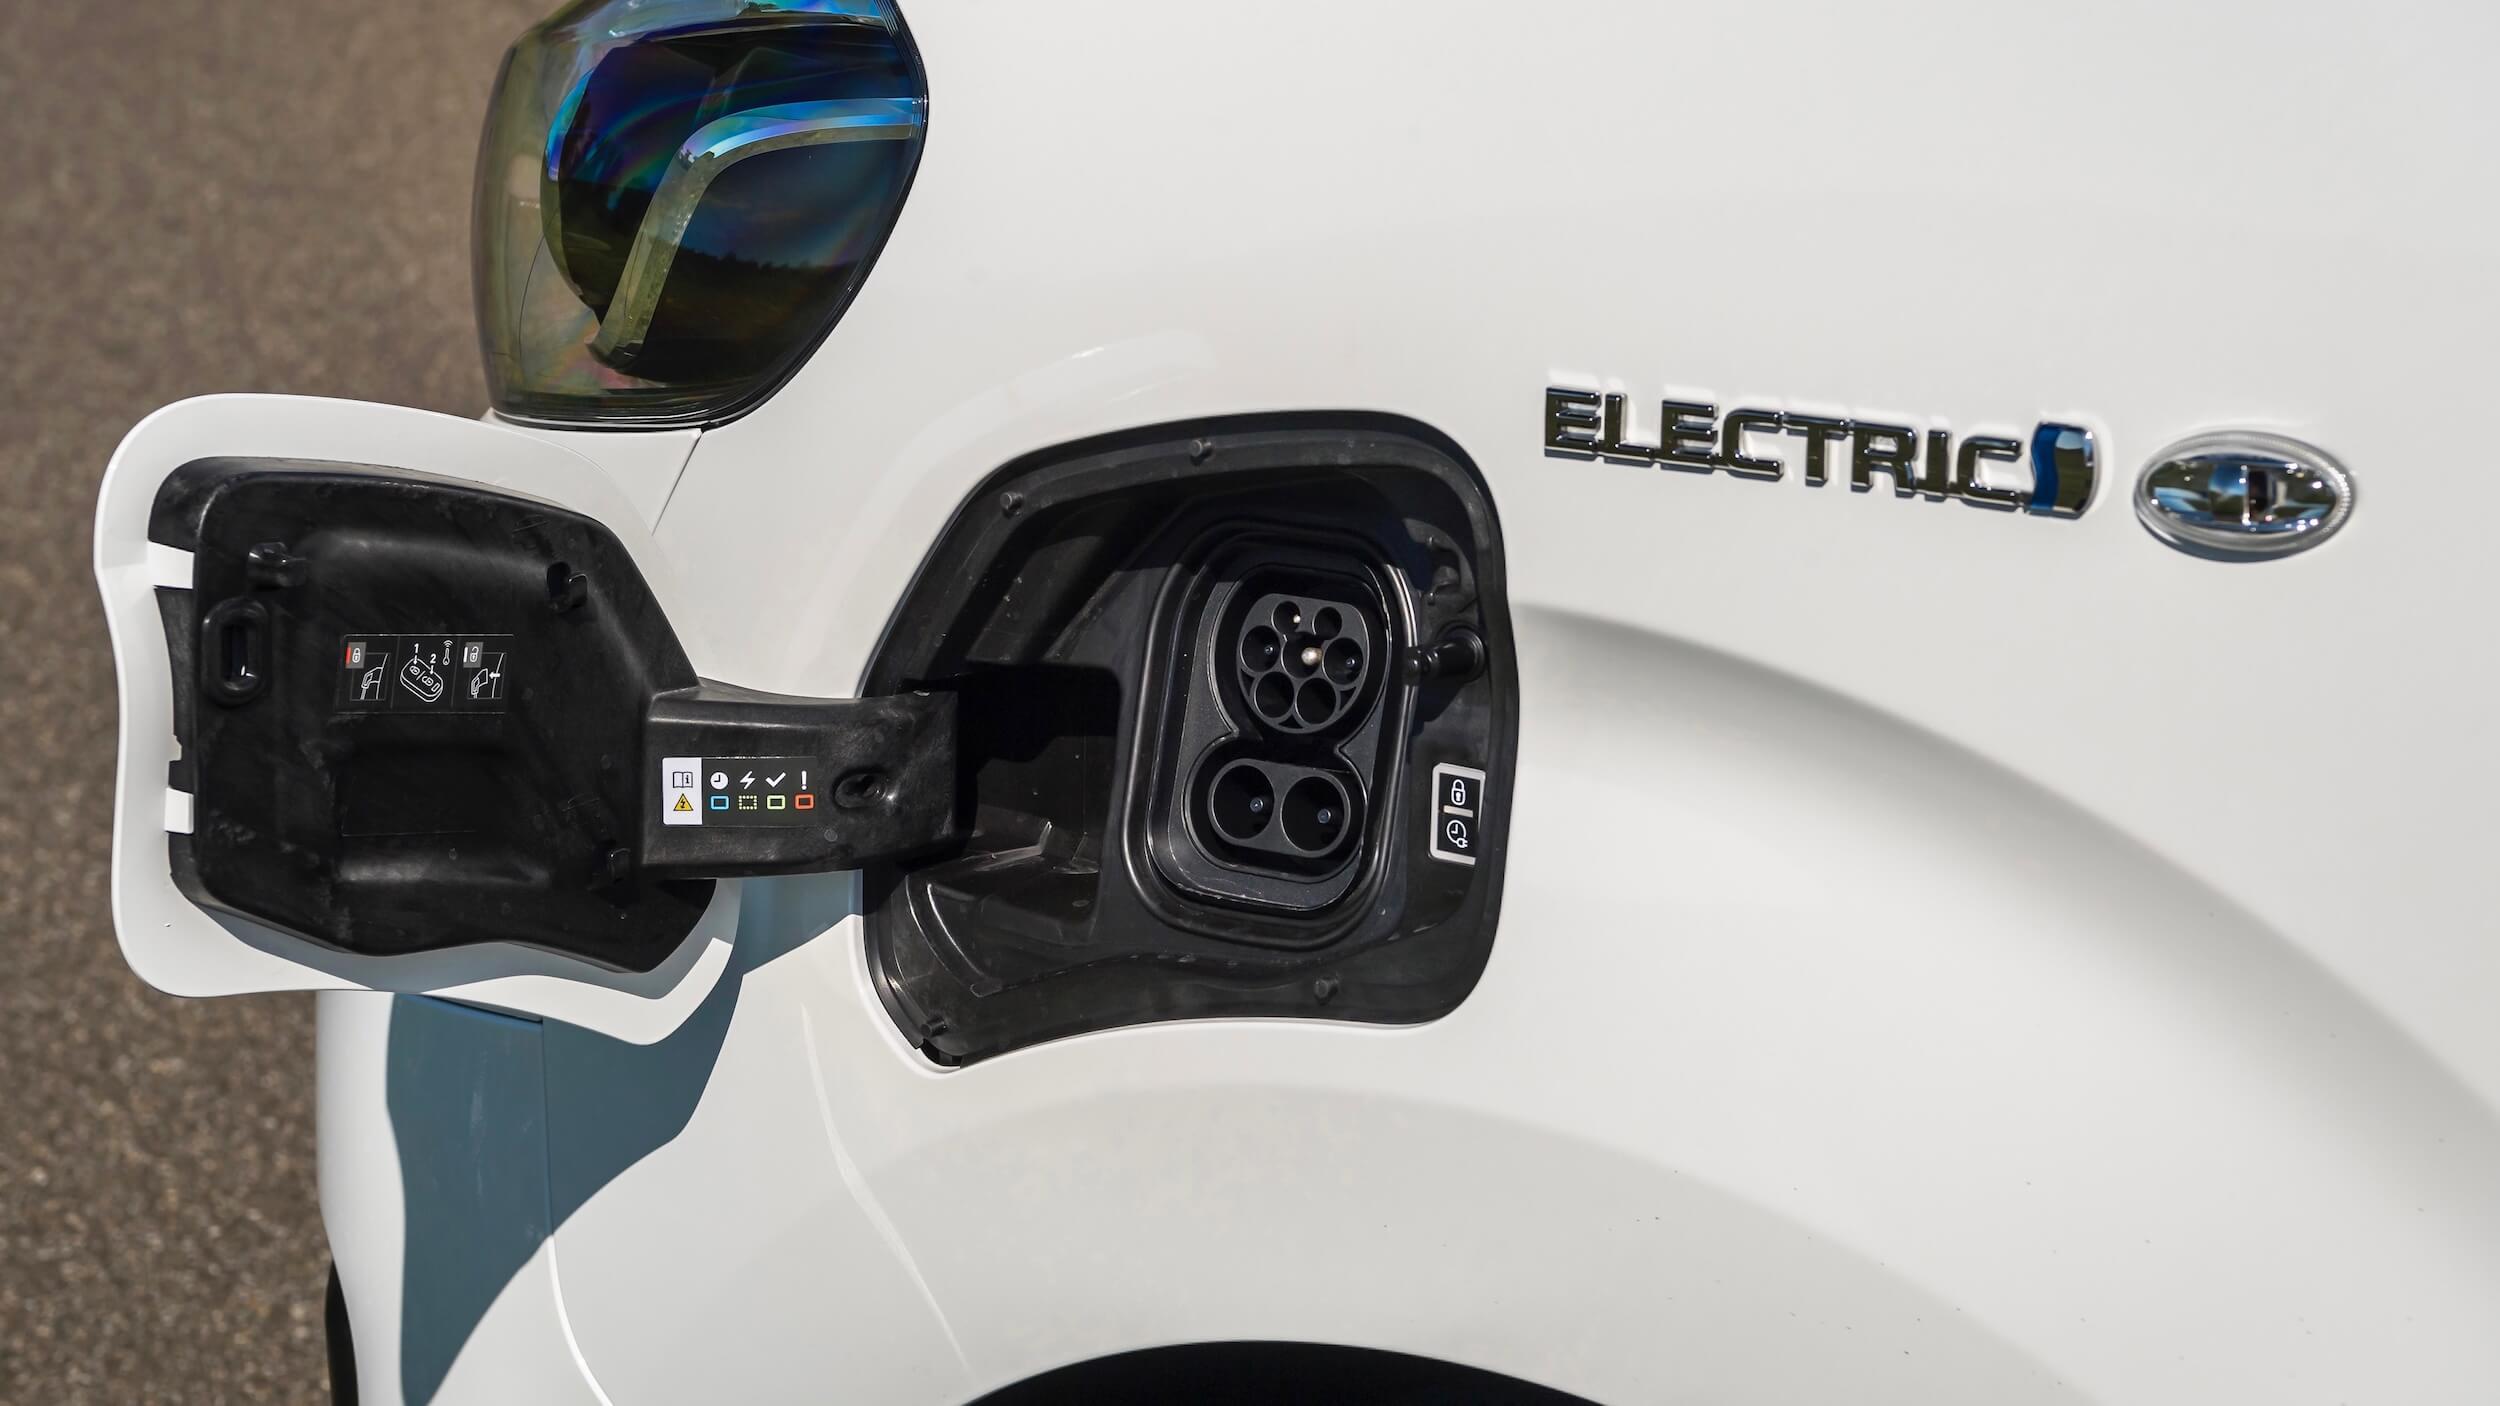 Toyota Proace Electric laad plug